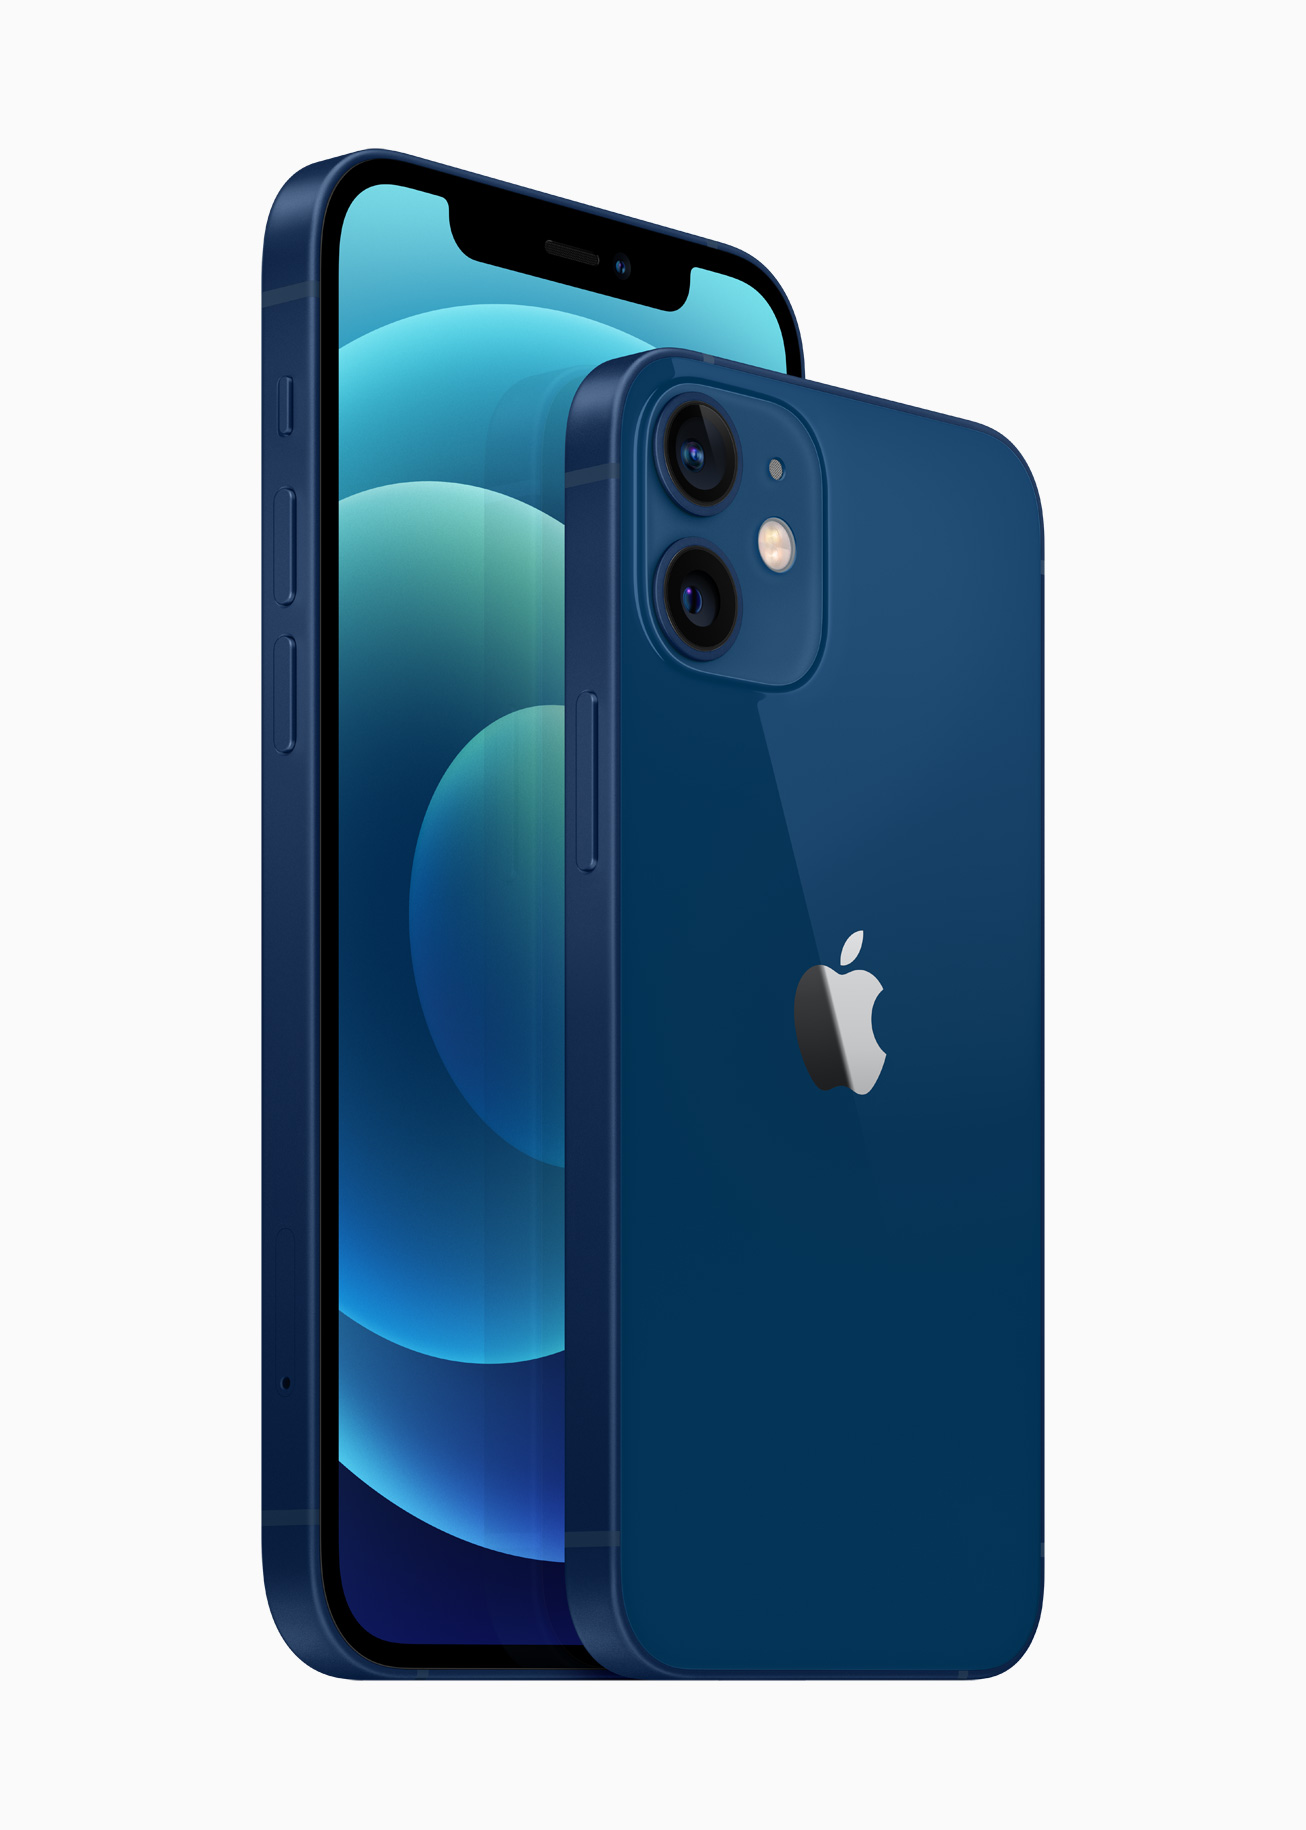 Apple компани iPhone 12, iPhone 12 Pro, iPhone 12 Pro Max, iPhone 12 mini ухаалаг утас танилцууллаа (фото 3)